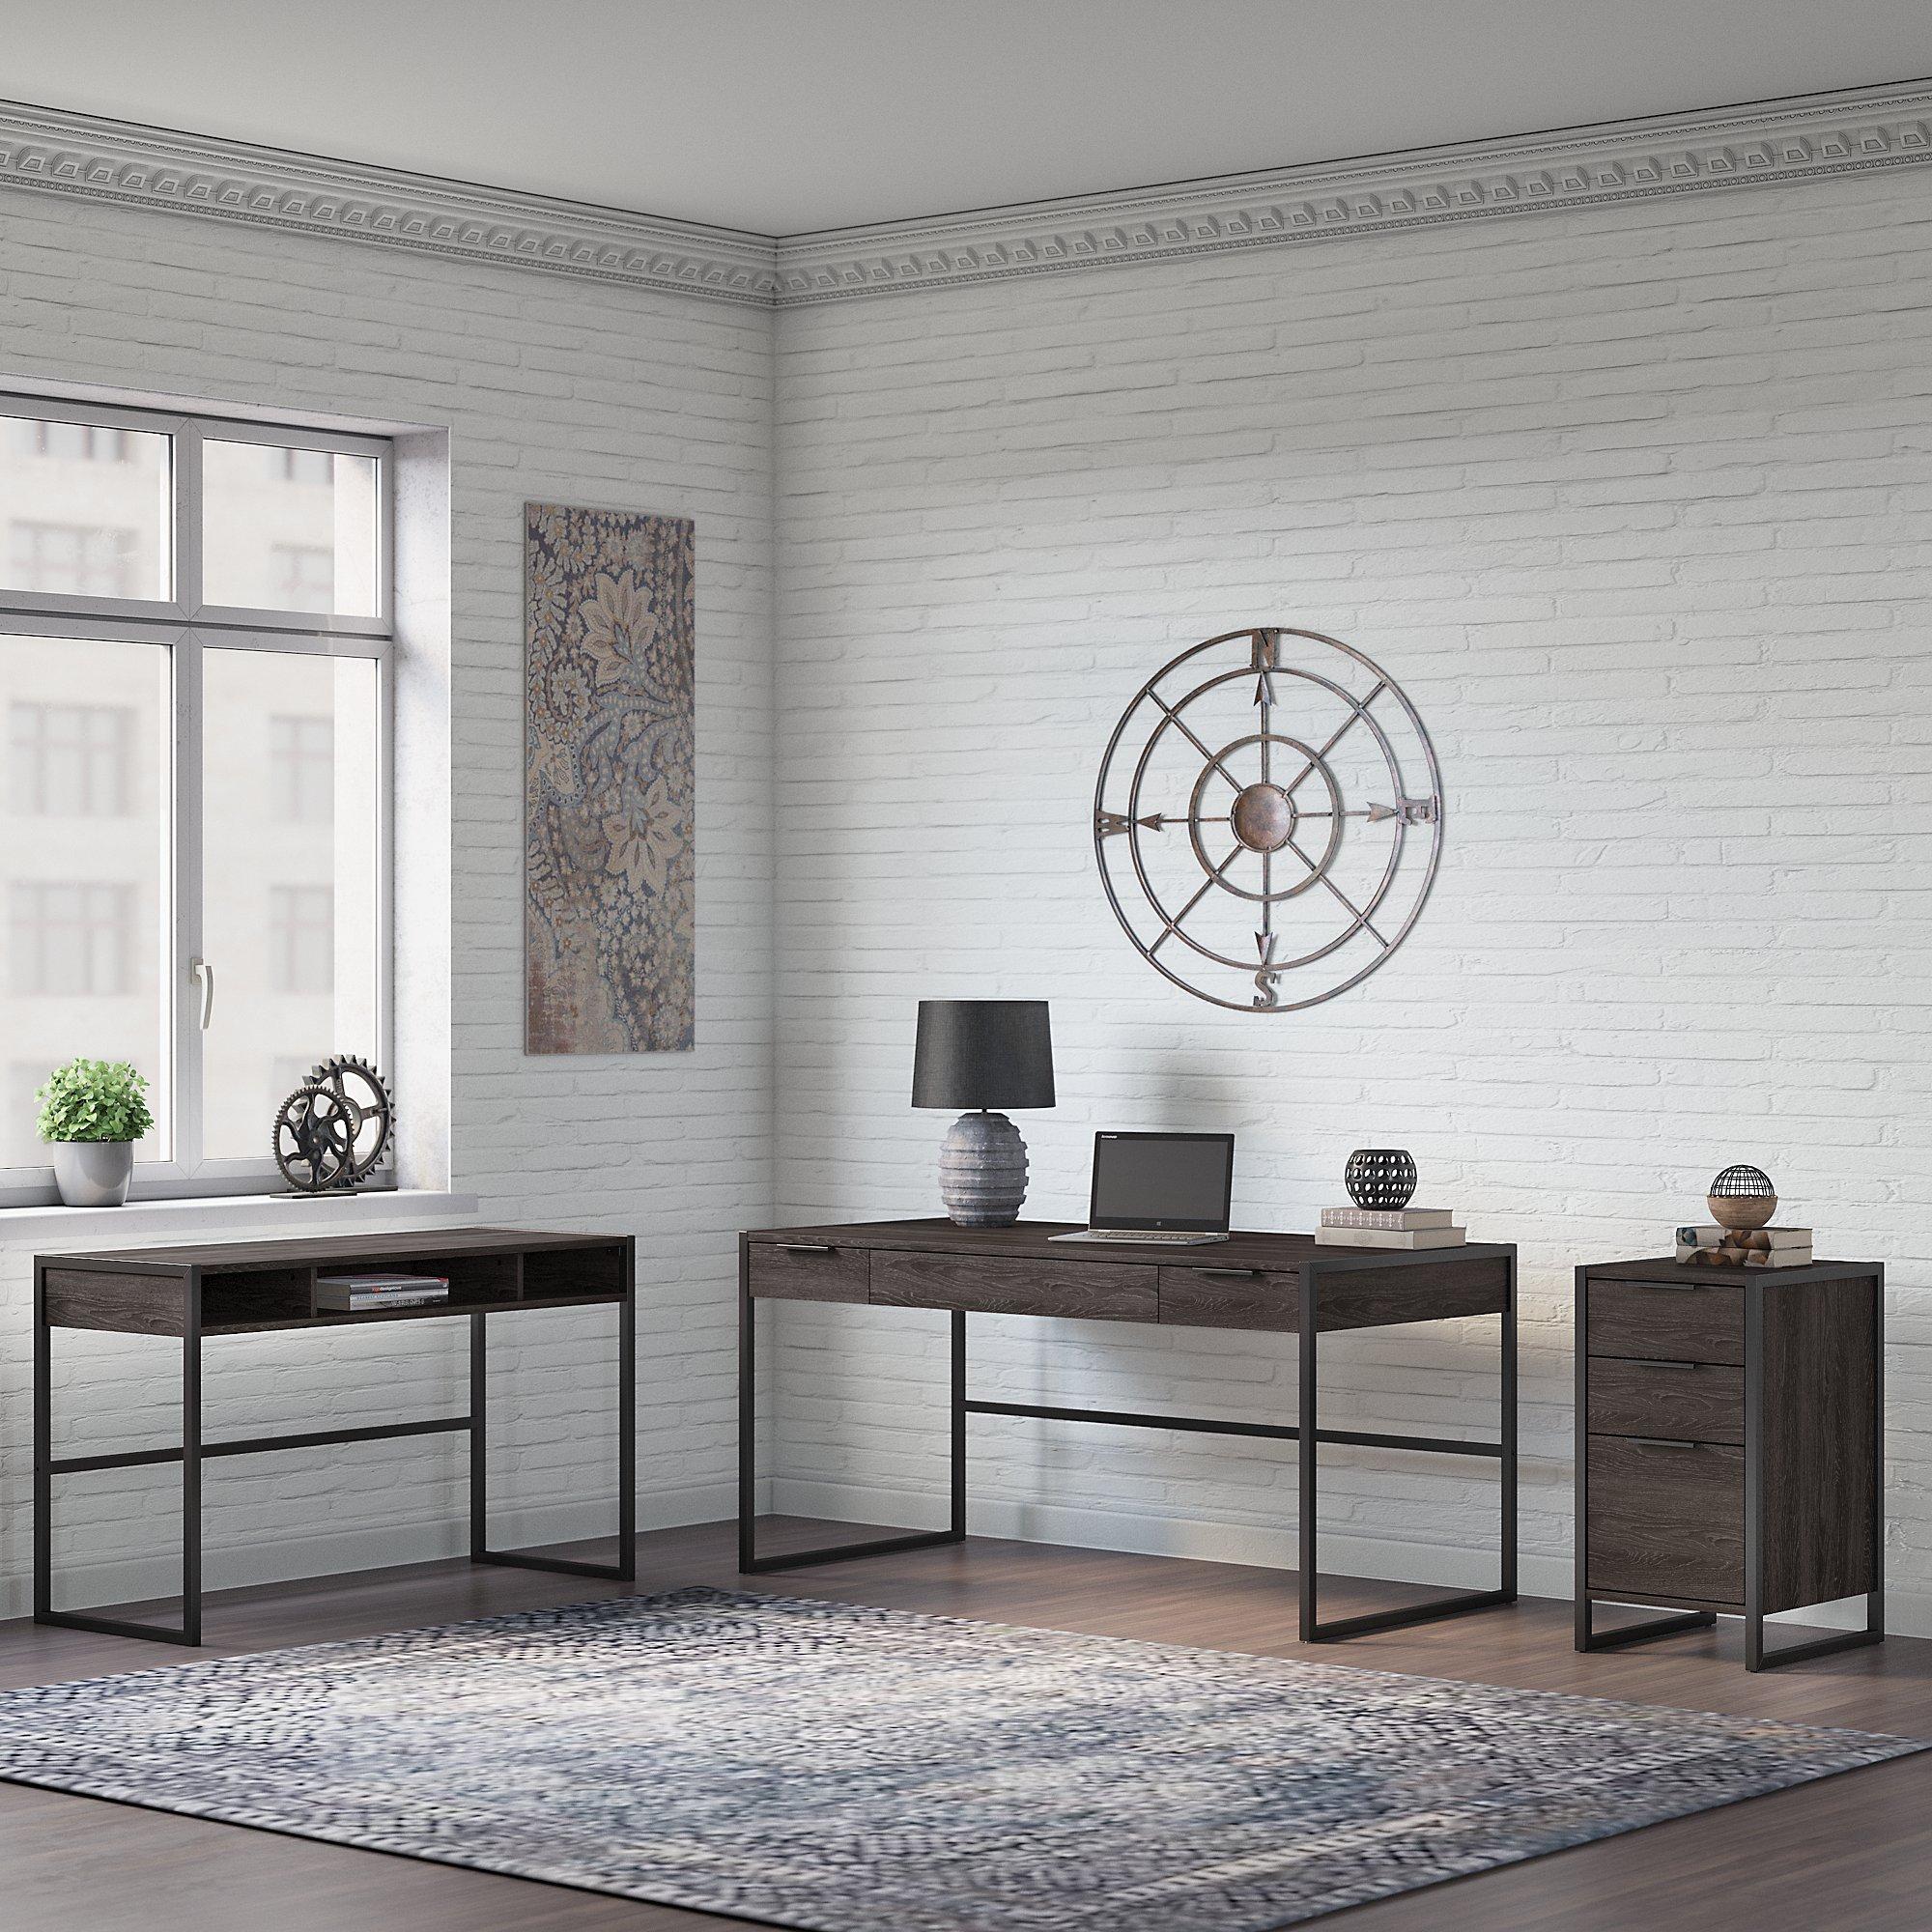 kathy ireland atr002 desk configuration